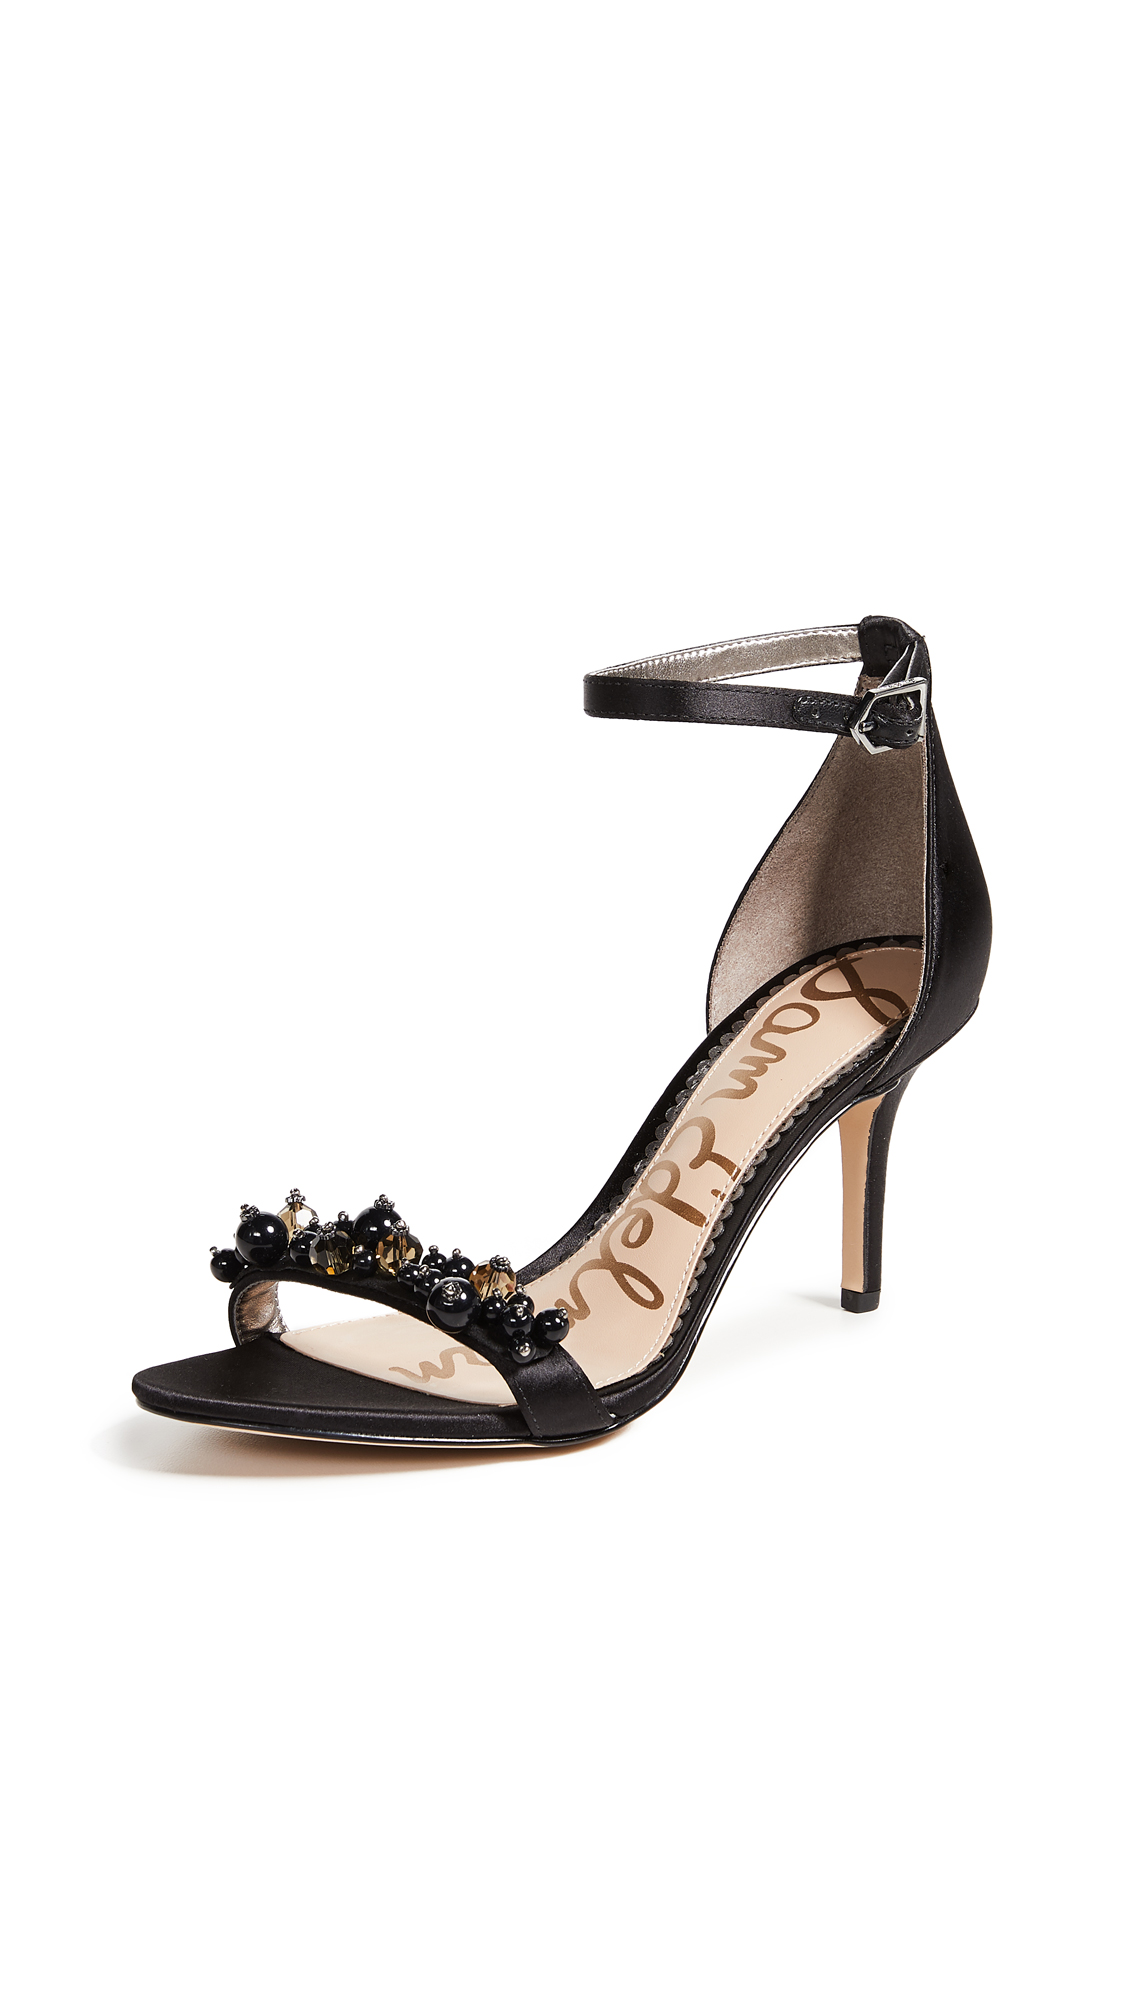 Sam Edelman Platt Sandals - Black